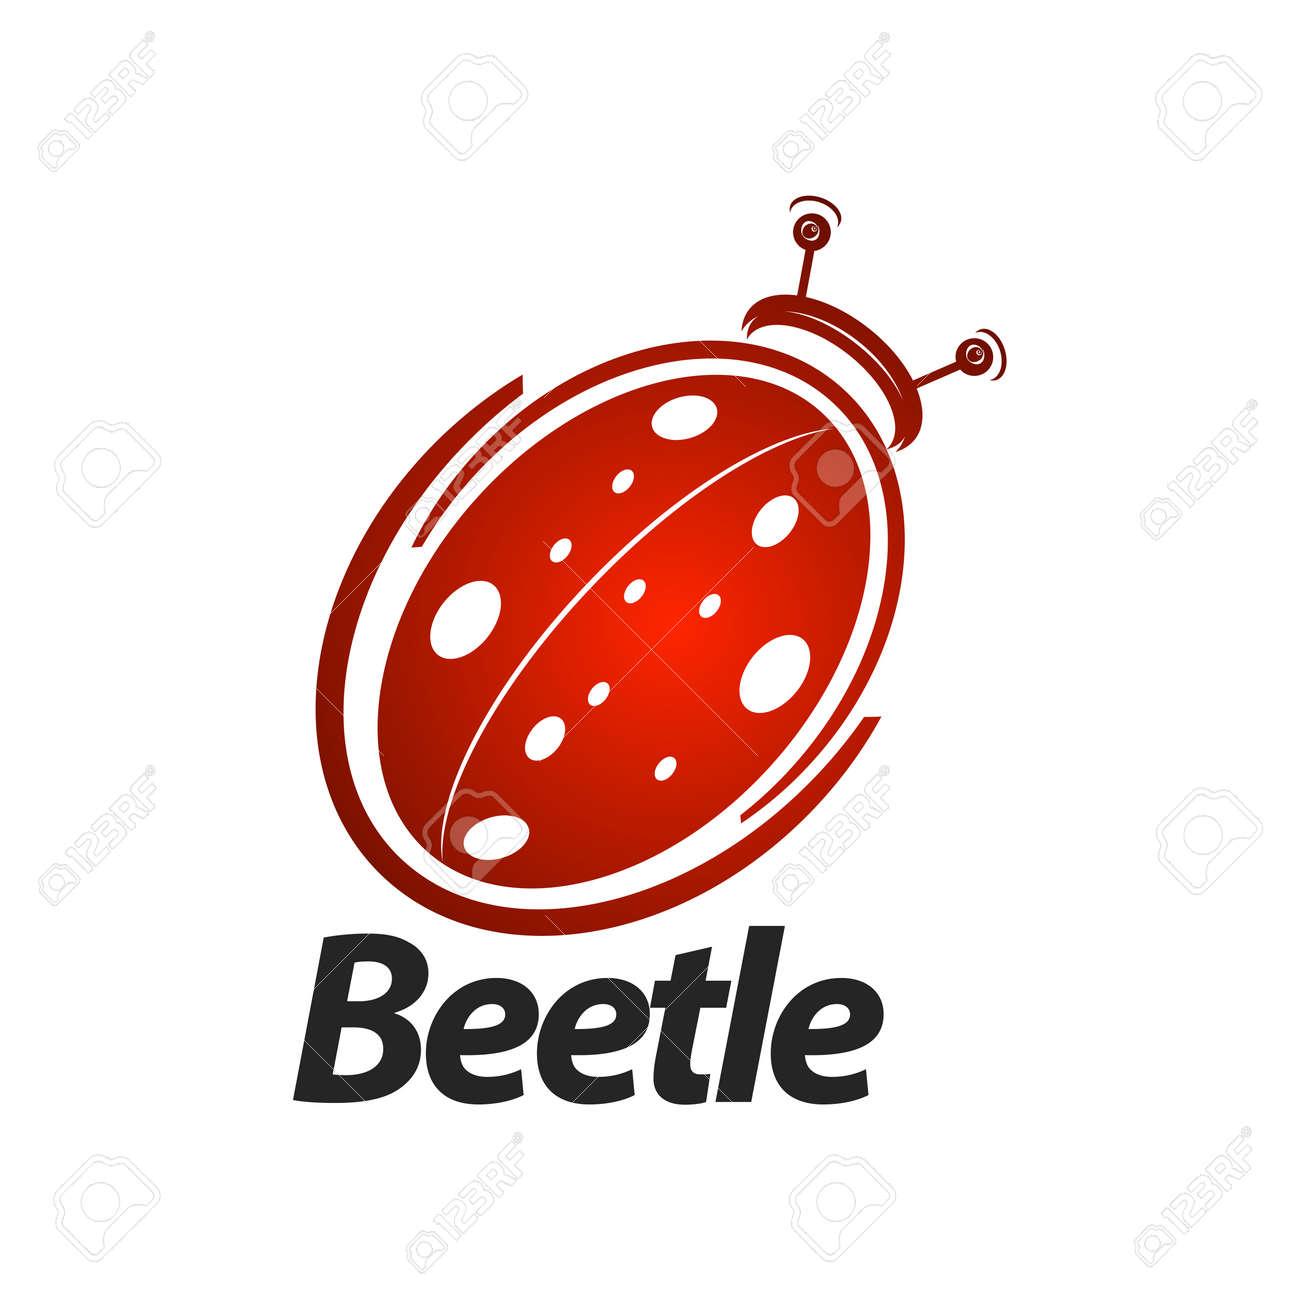 Beetle logo concept design. Symbol graphic template element vector - 143647633